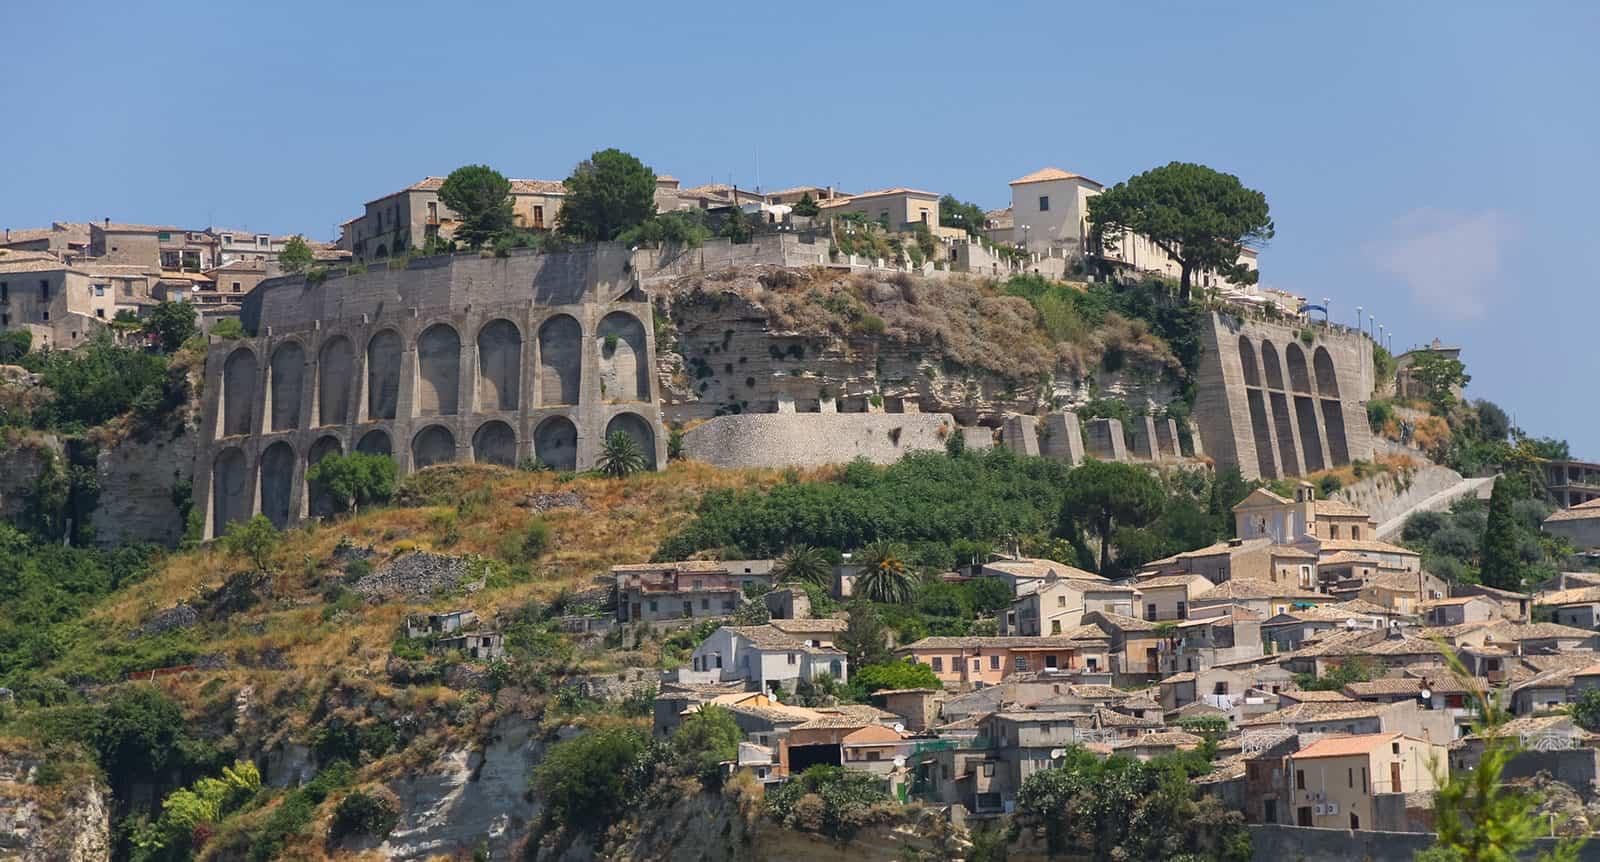 Gerace - © Vaghis - viaggi & turismo Italia - Tutti i diritti riservati